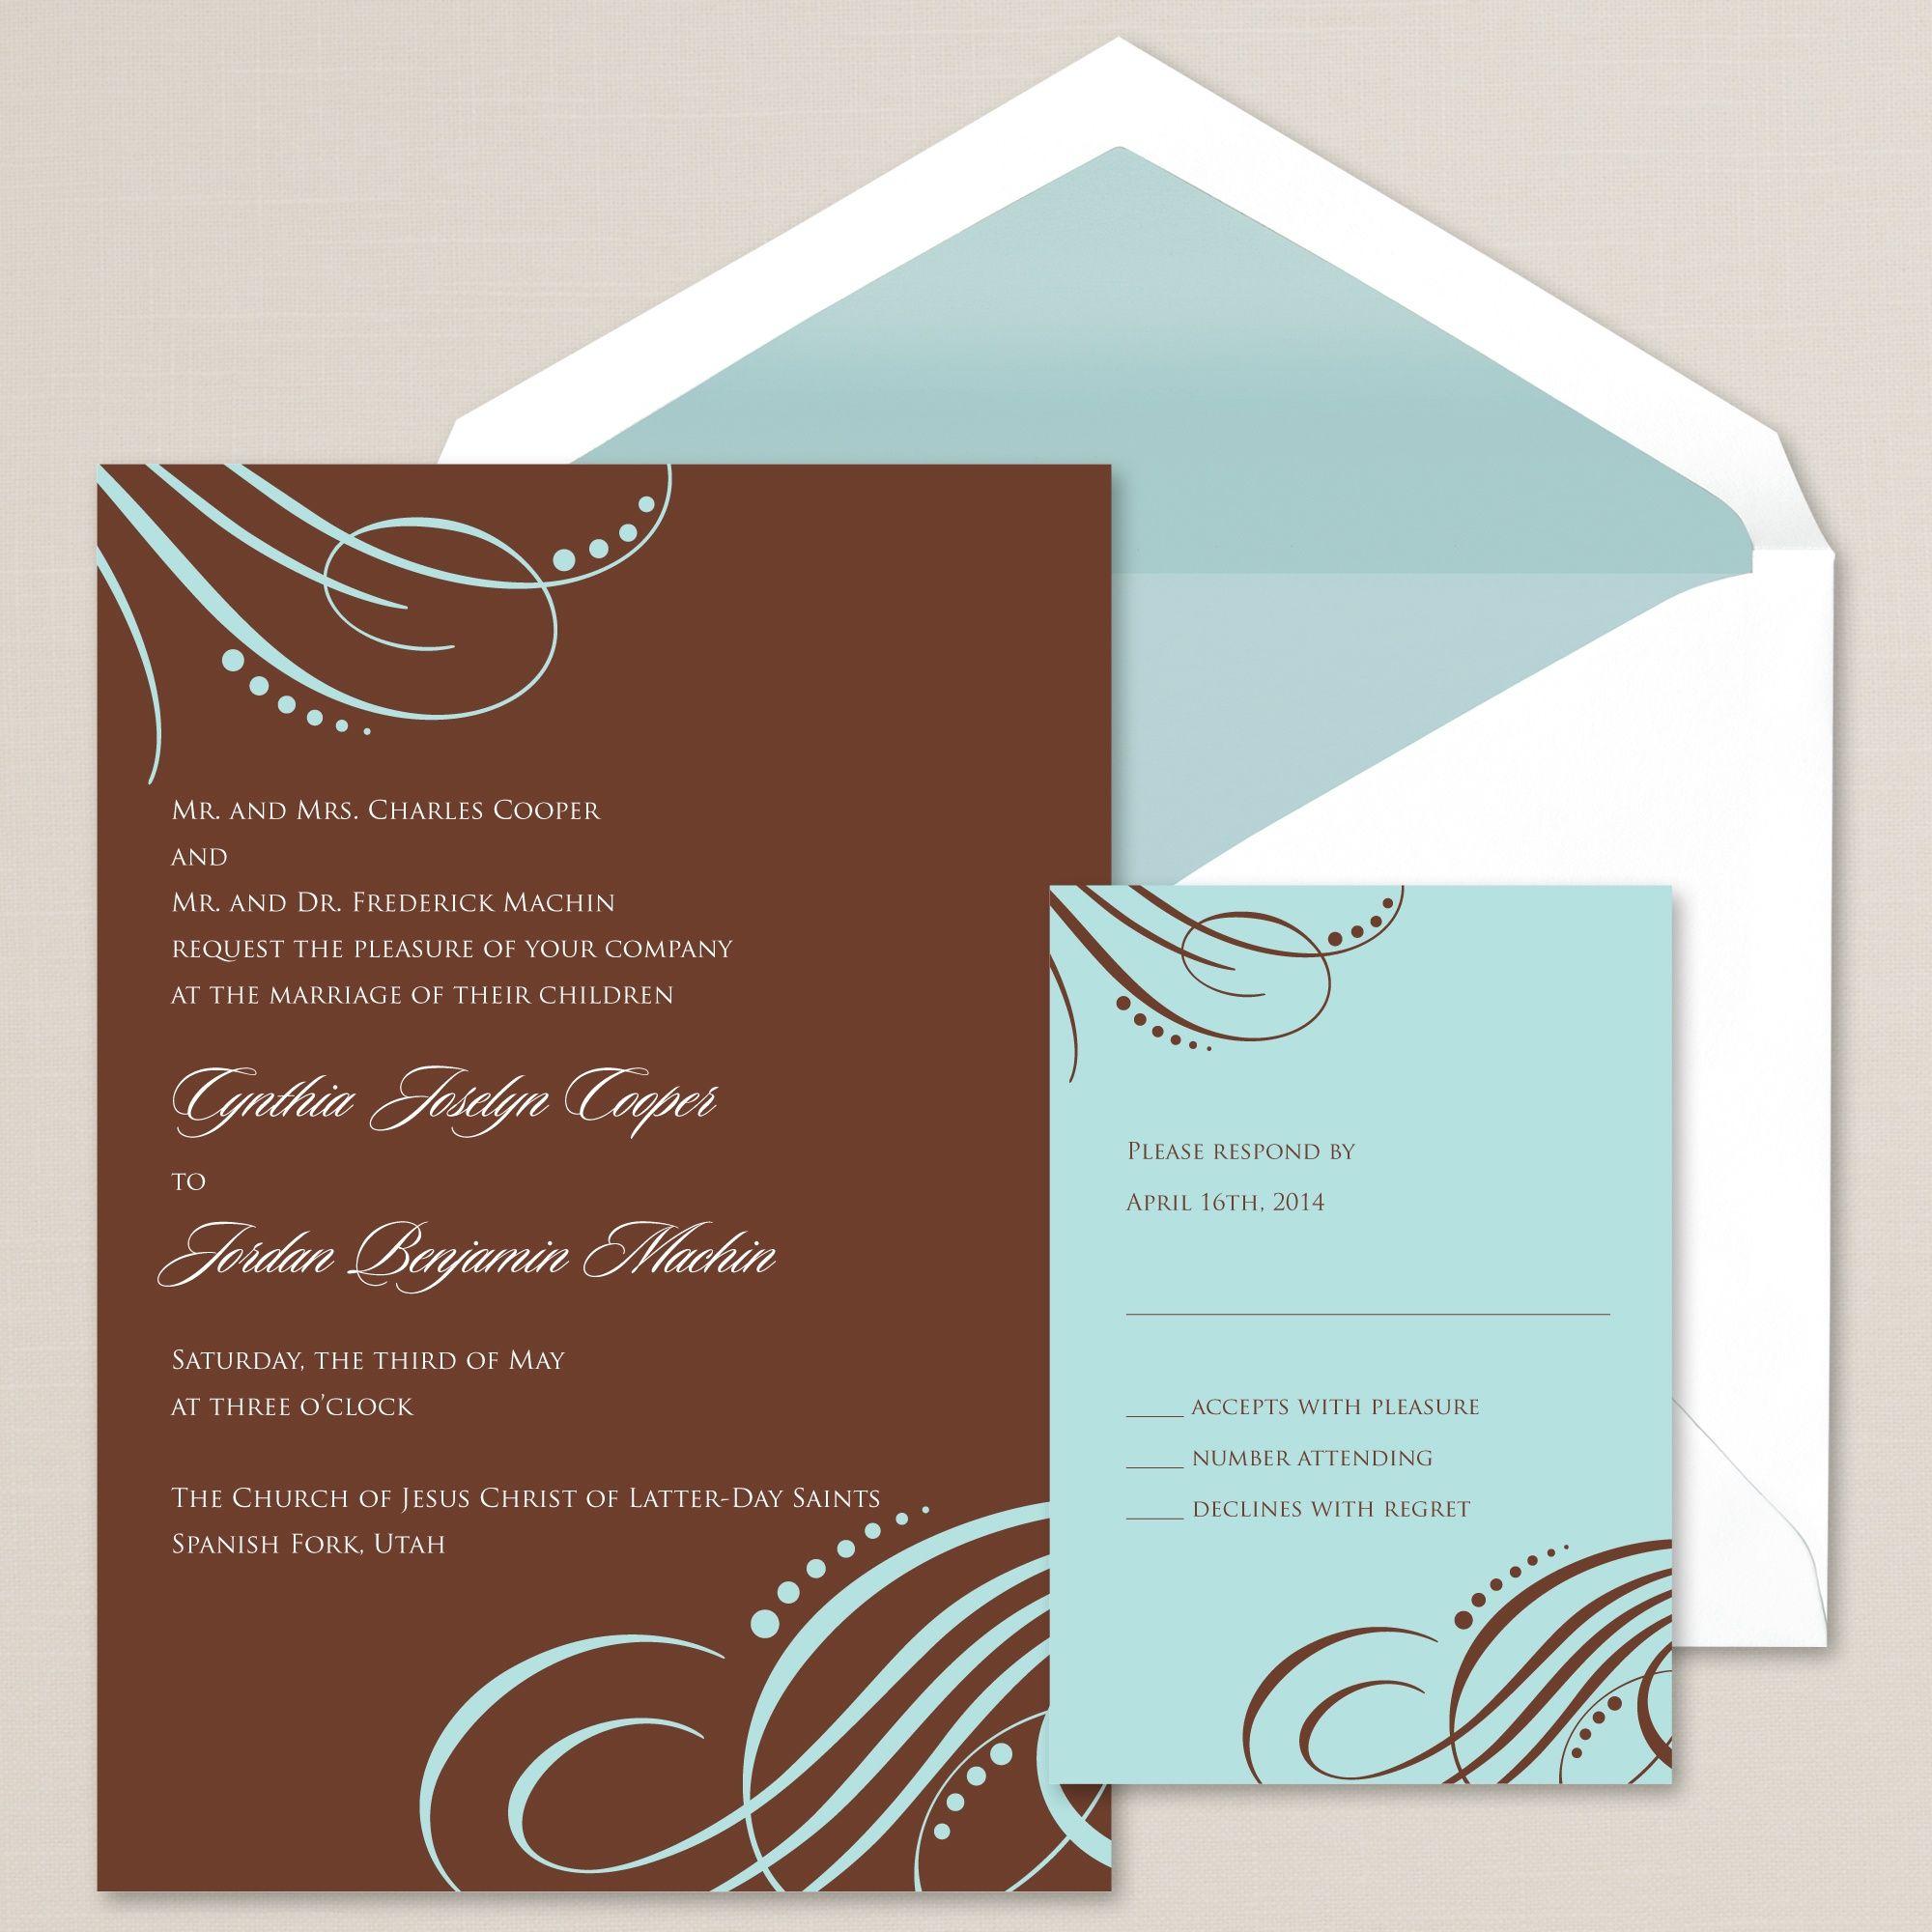 Contemporary Flourish Wedding Invitation | #exclusivelyweddings I ...